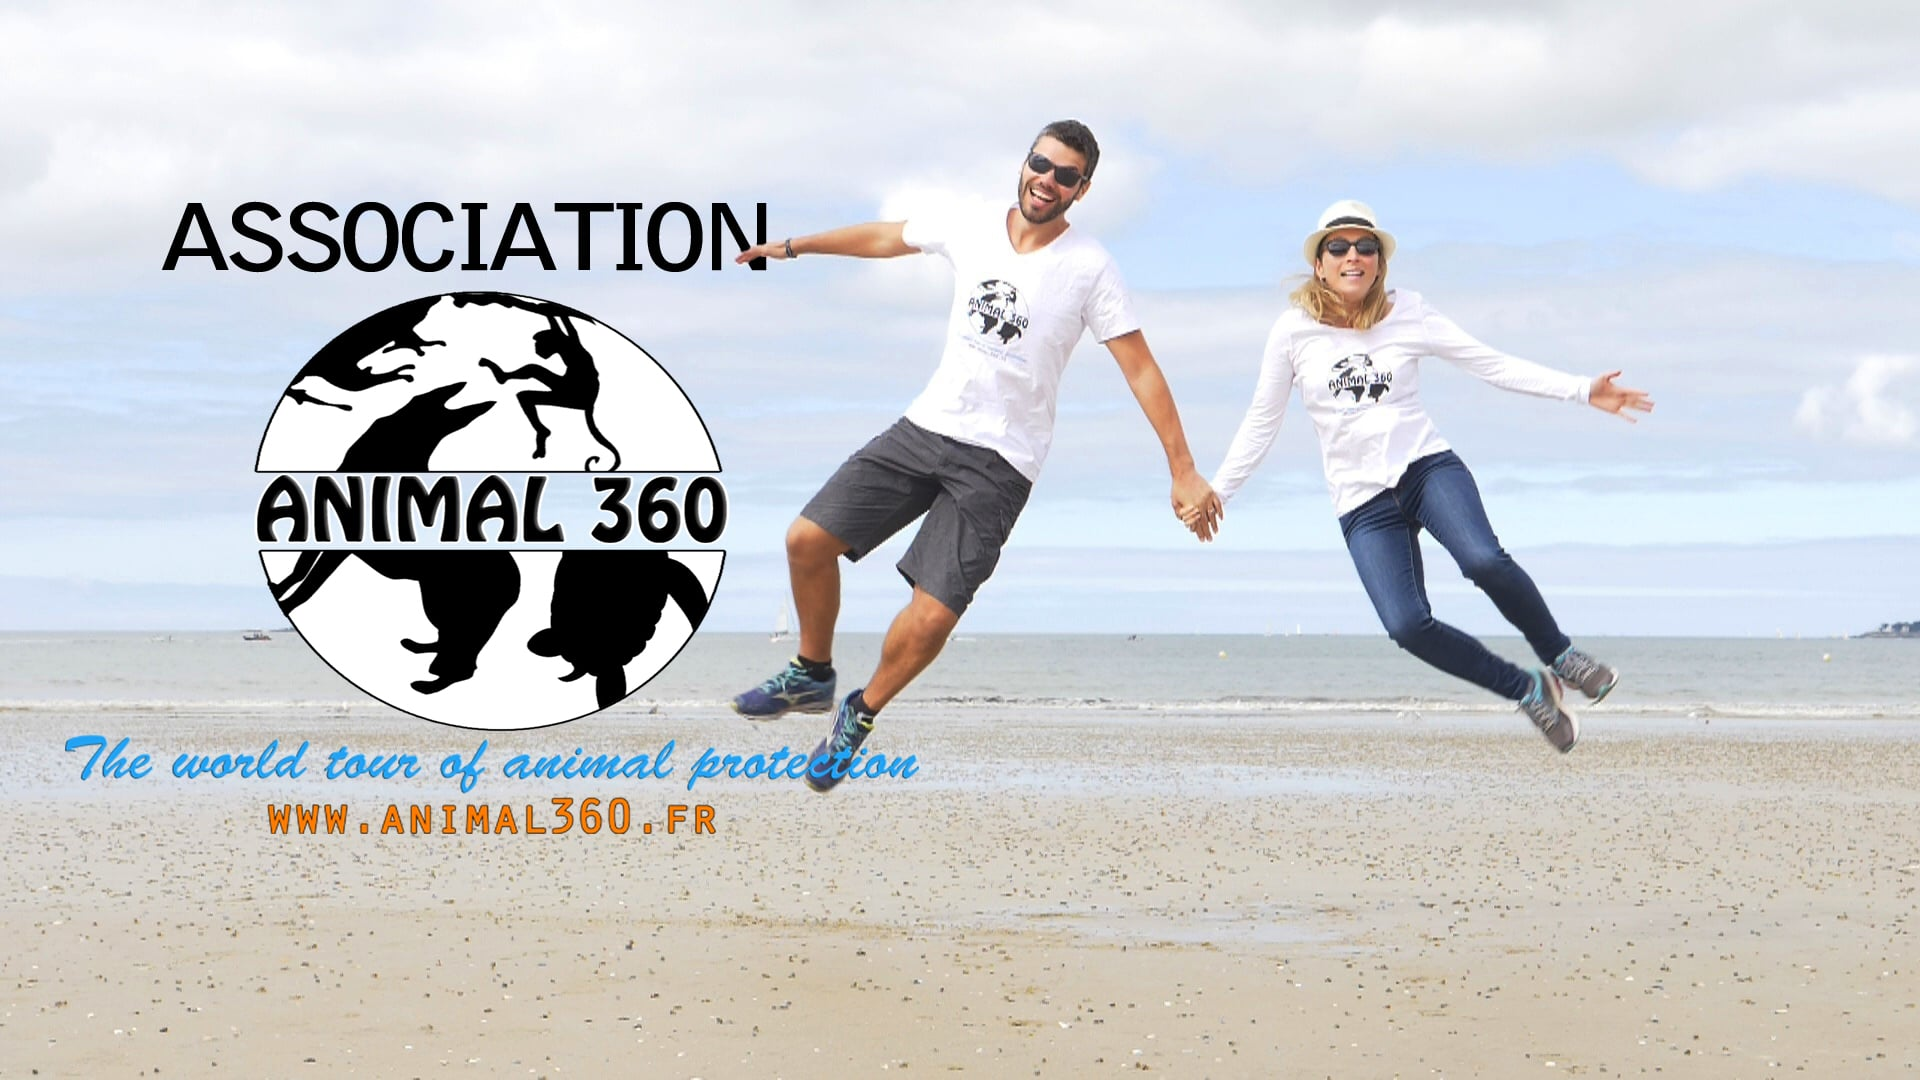 Animal 360 association